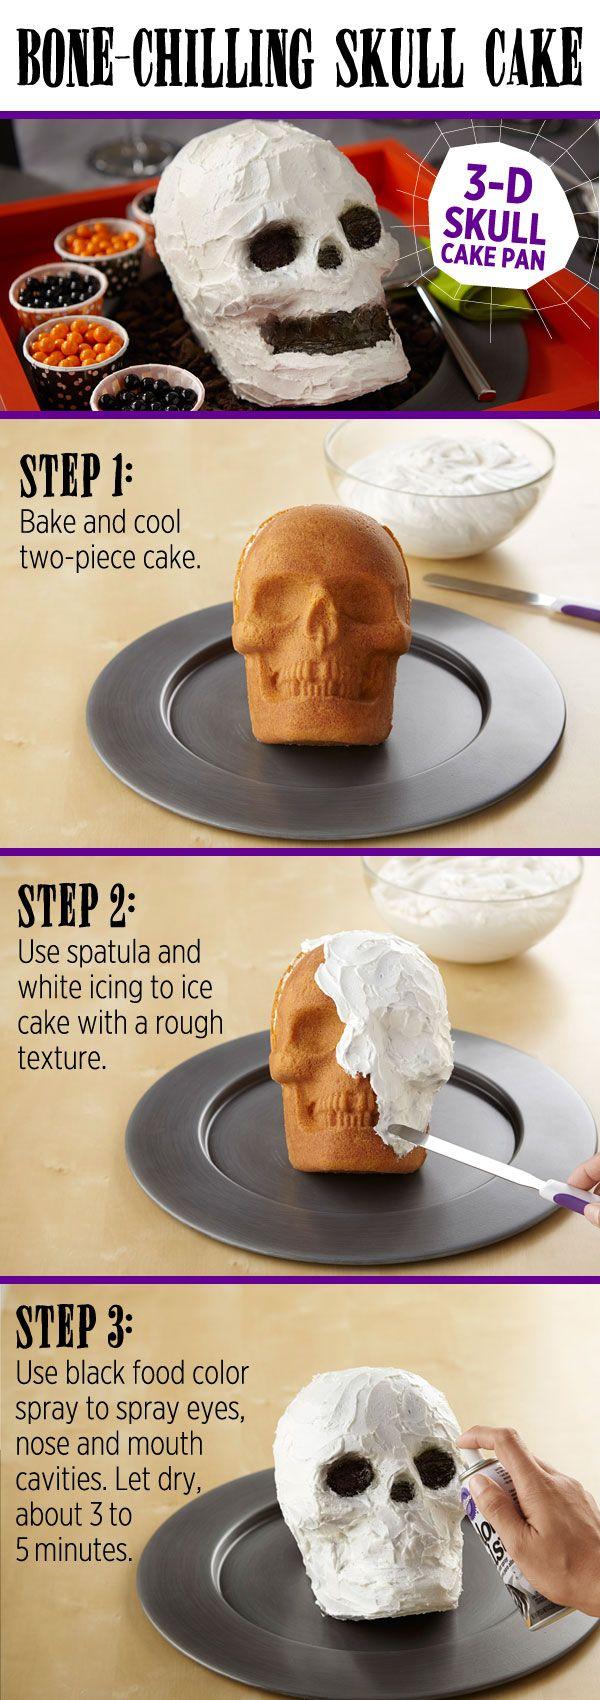 Use the Wilton 3-D Skull Pan to bake an easy 3-dimensional skull cake.